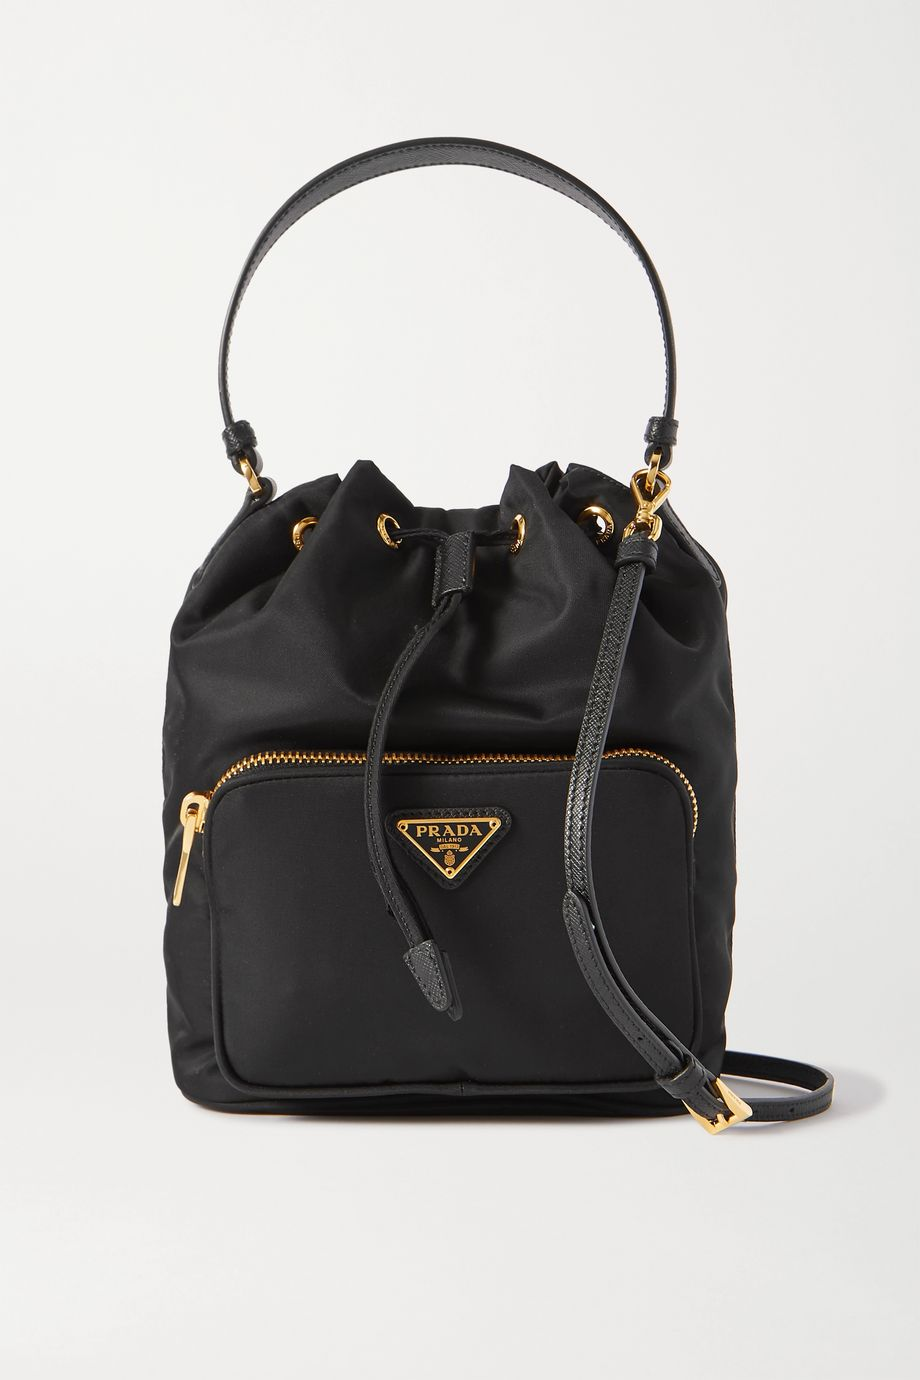 Prada Vela small textured leather-trimmed nylon bucket bag